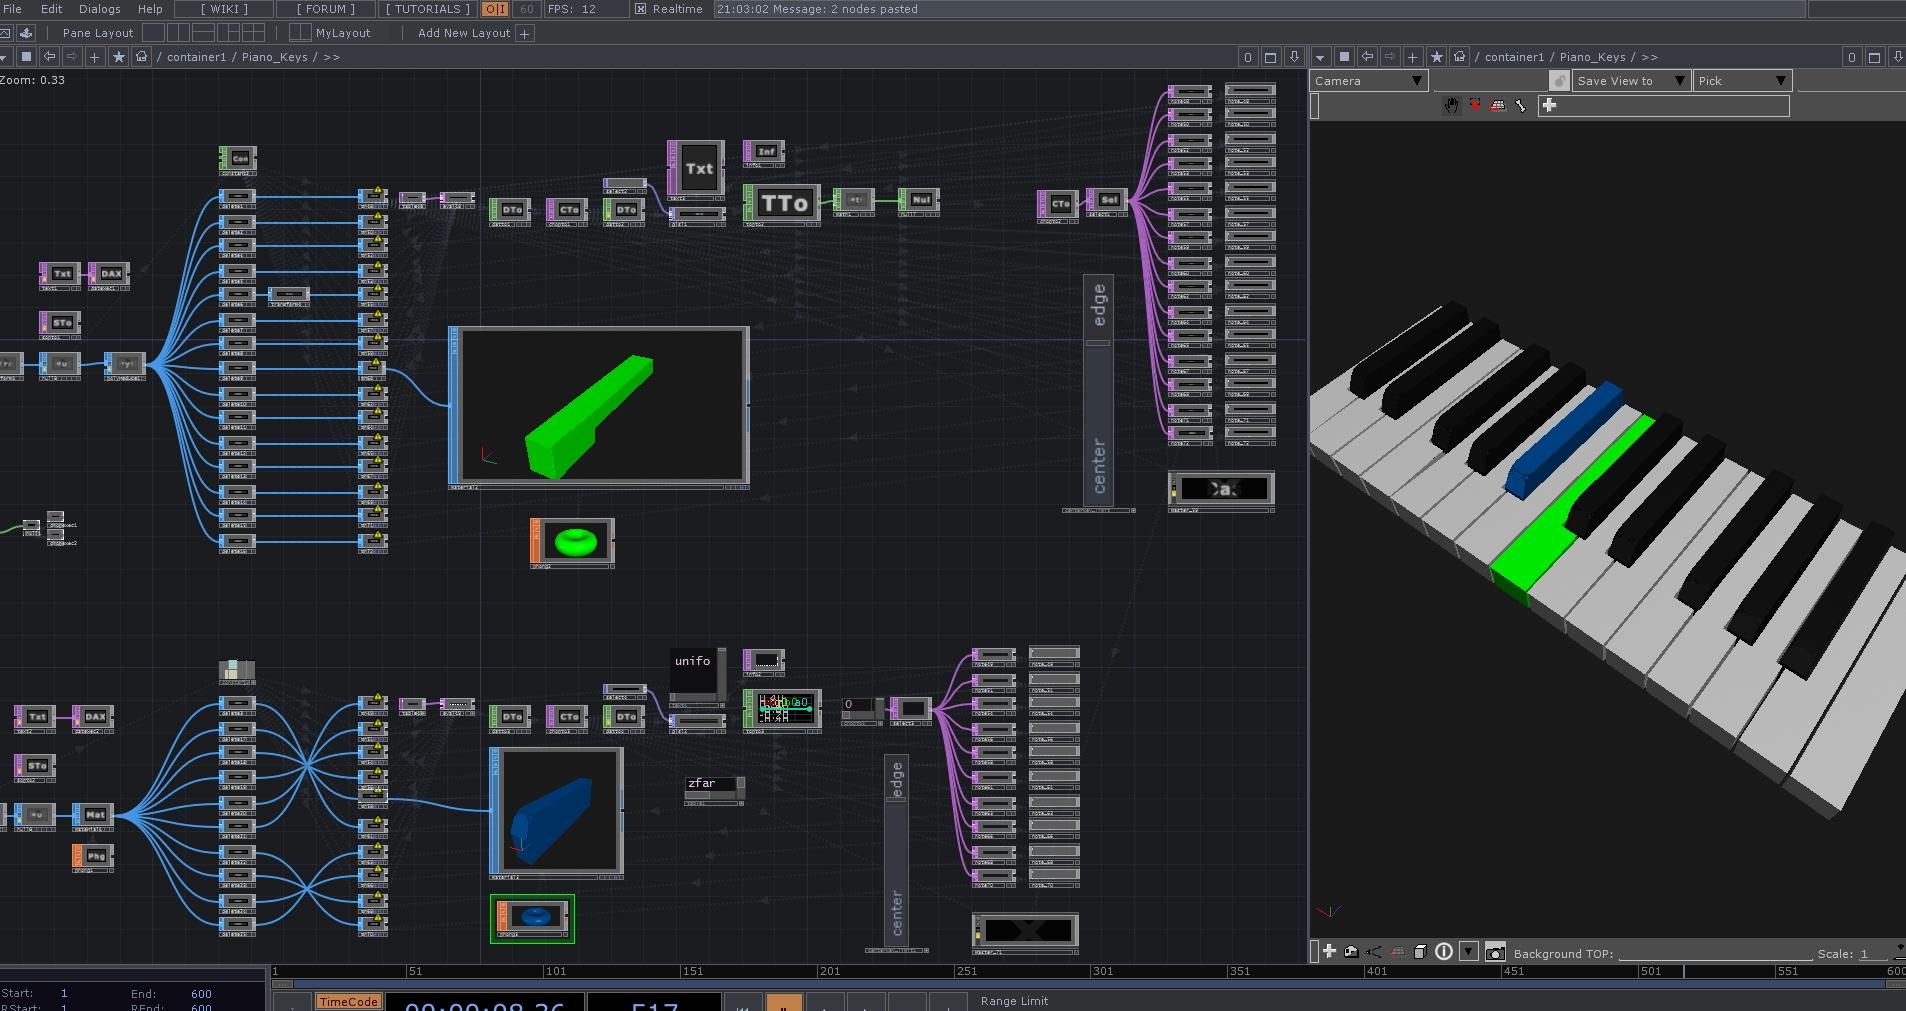 piano_netword_screenshot.jpg